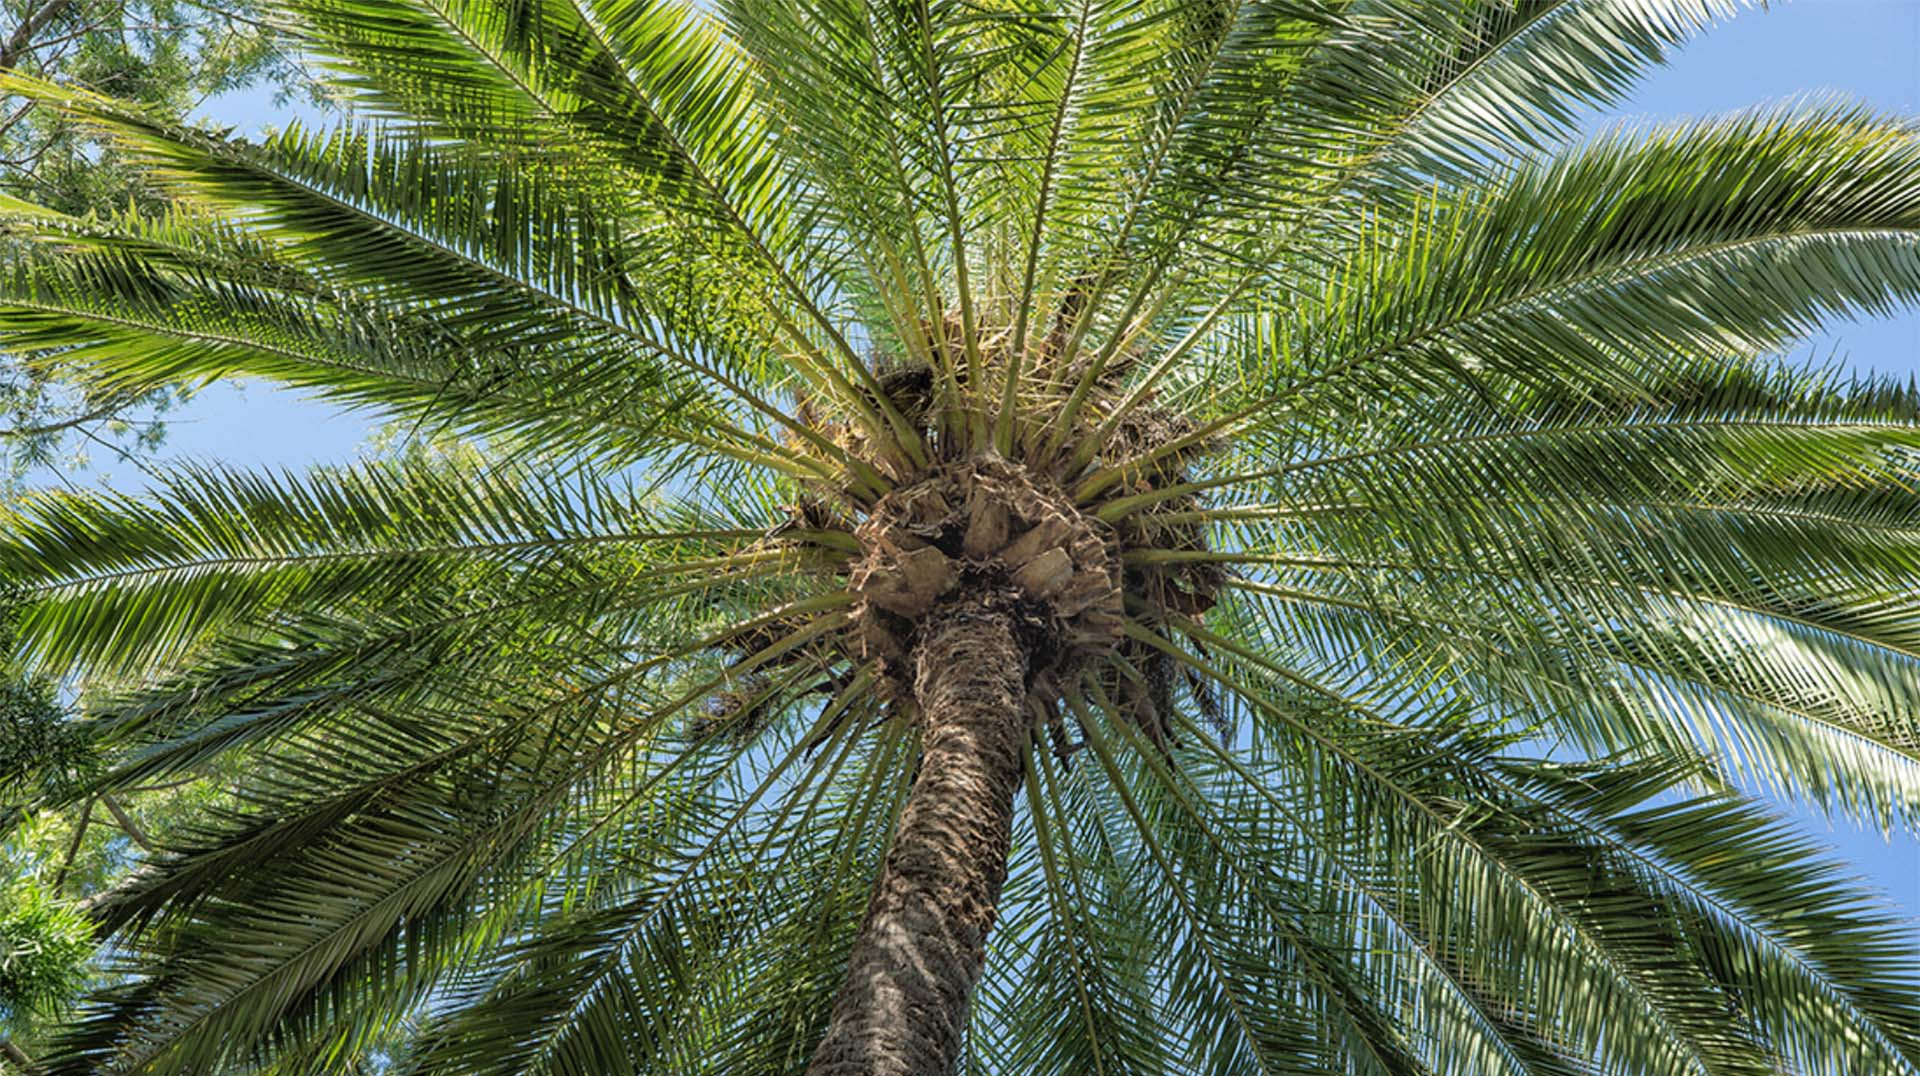 palm san diego zoo animals plants. Black Bedroom Furniture Sets. Home Design Ideas